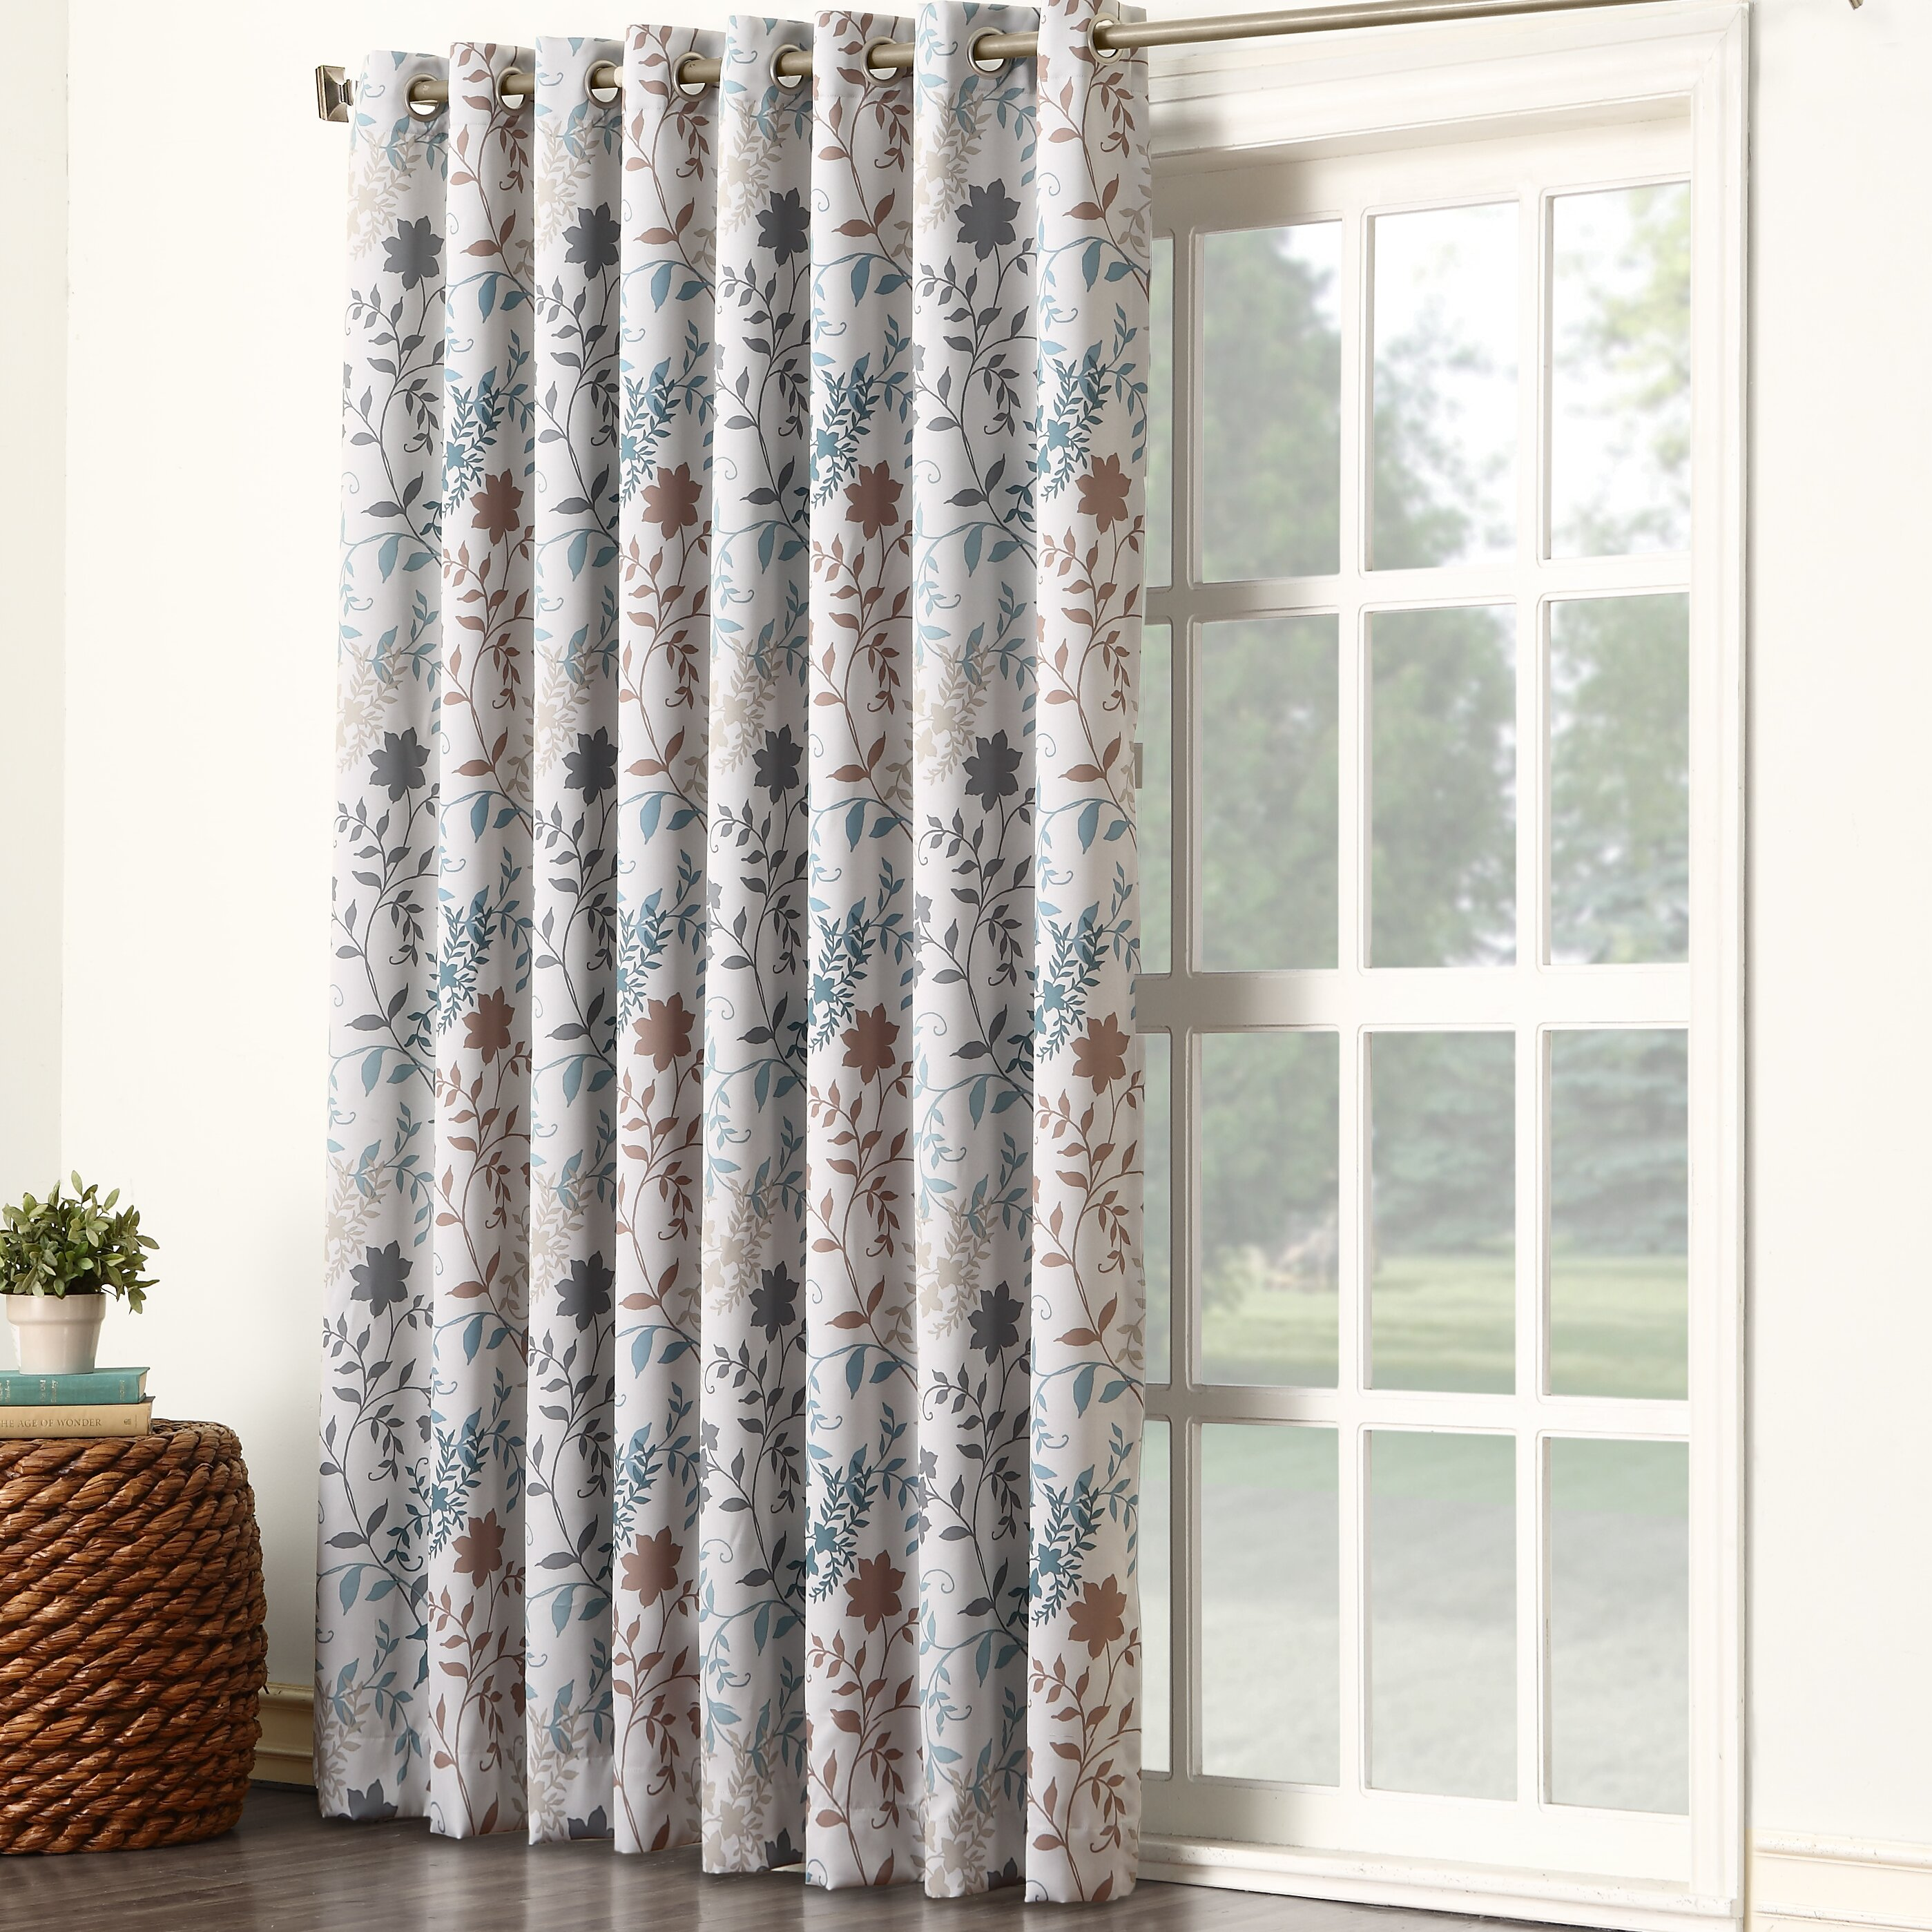 sun zero auburn floral extra wide grommet patio door single curtain panel reviews wayfair. Black Bedroom Furniture Sets. Home Design Ideas